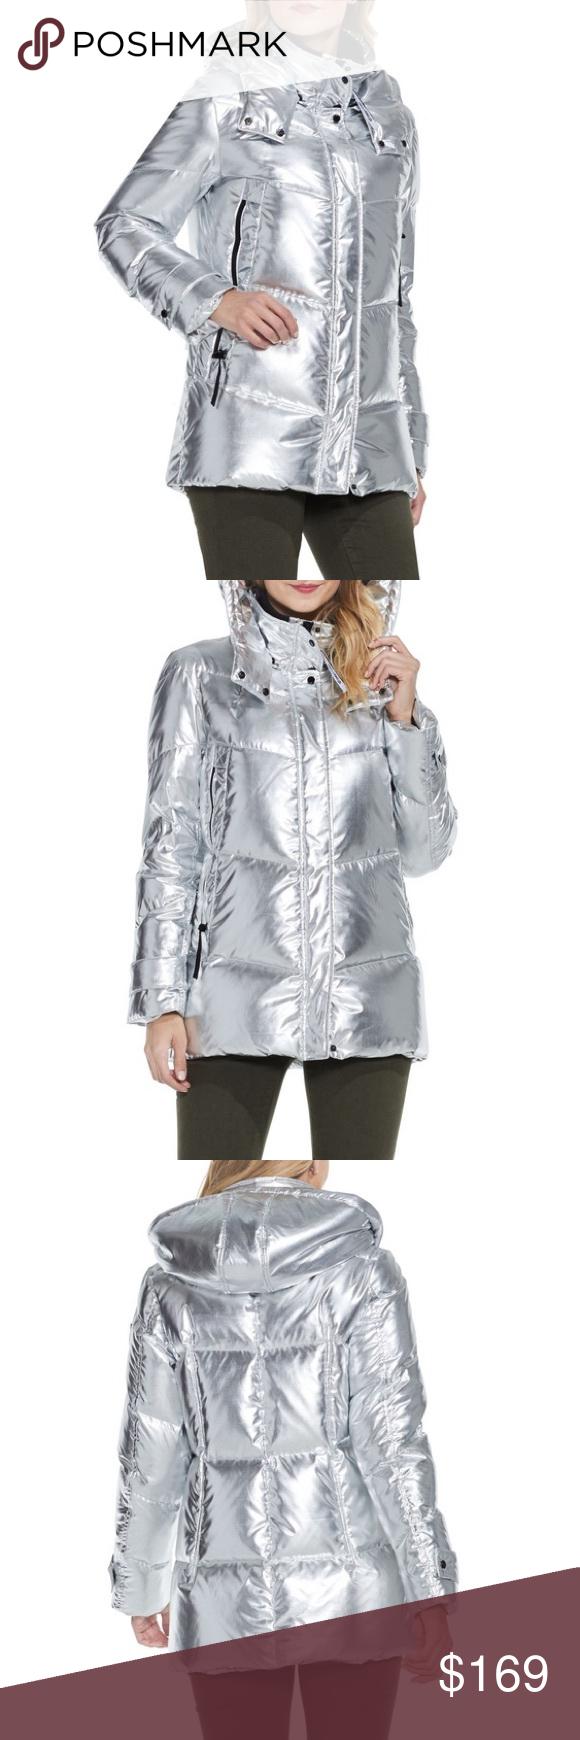 Vince Camuto Metallic Silver Puffer Coat Fashion Clothes Design Fashion Design [ 1740 x 580 Pixel ]